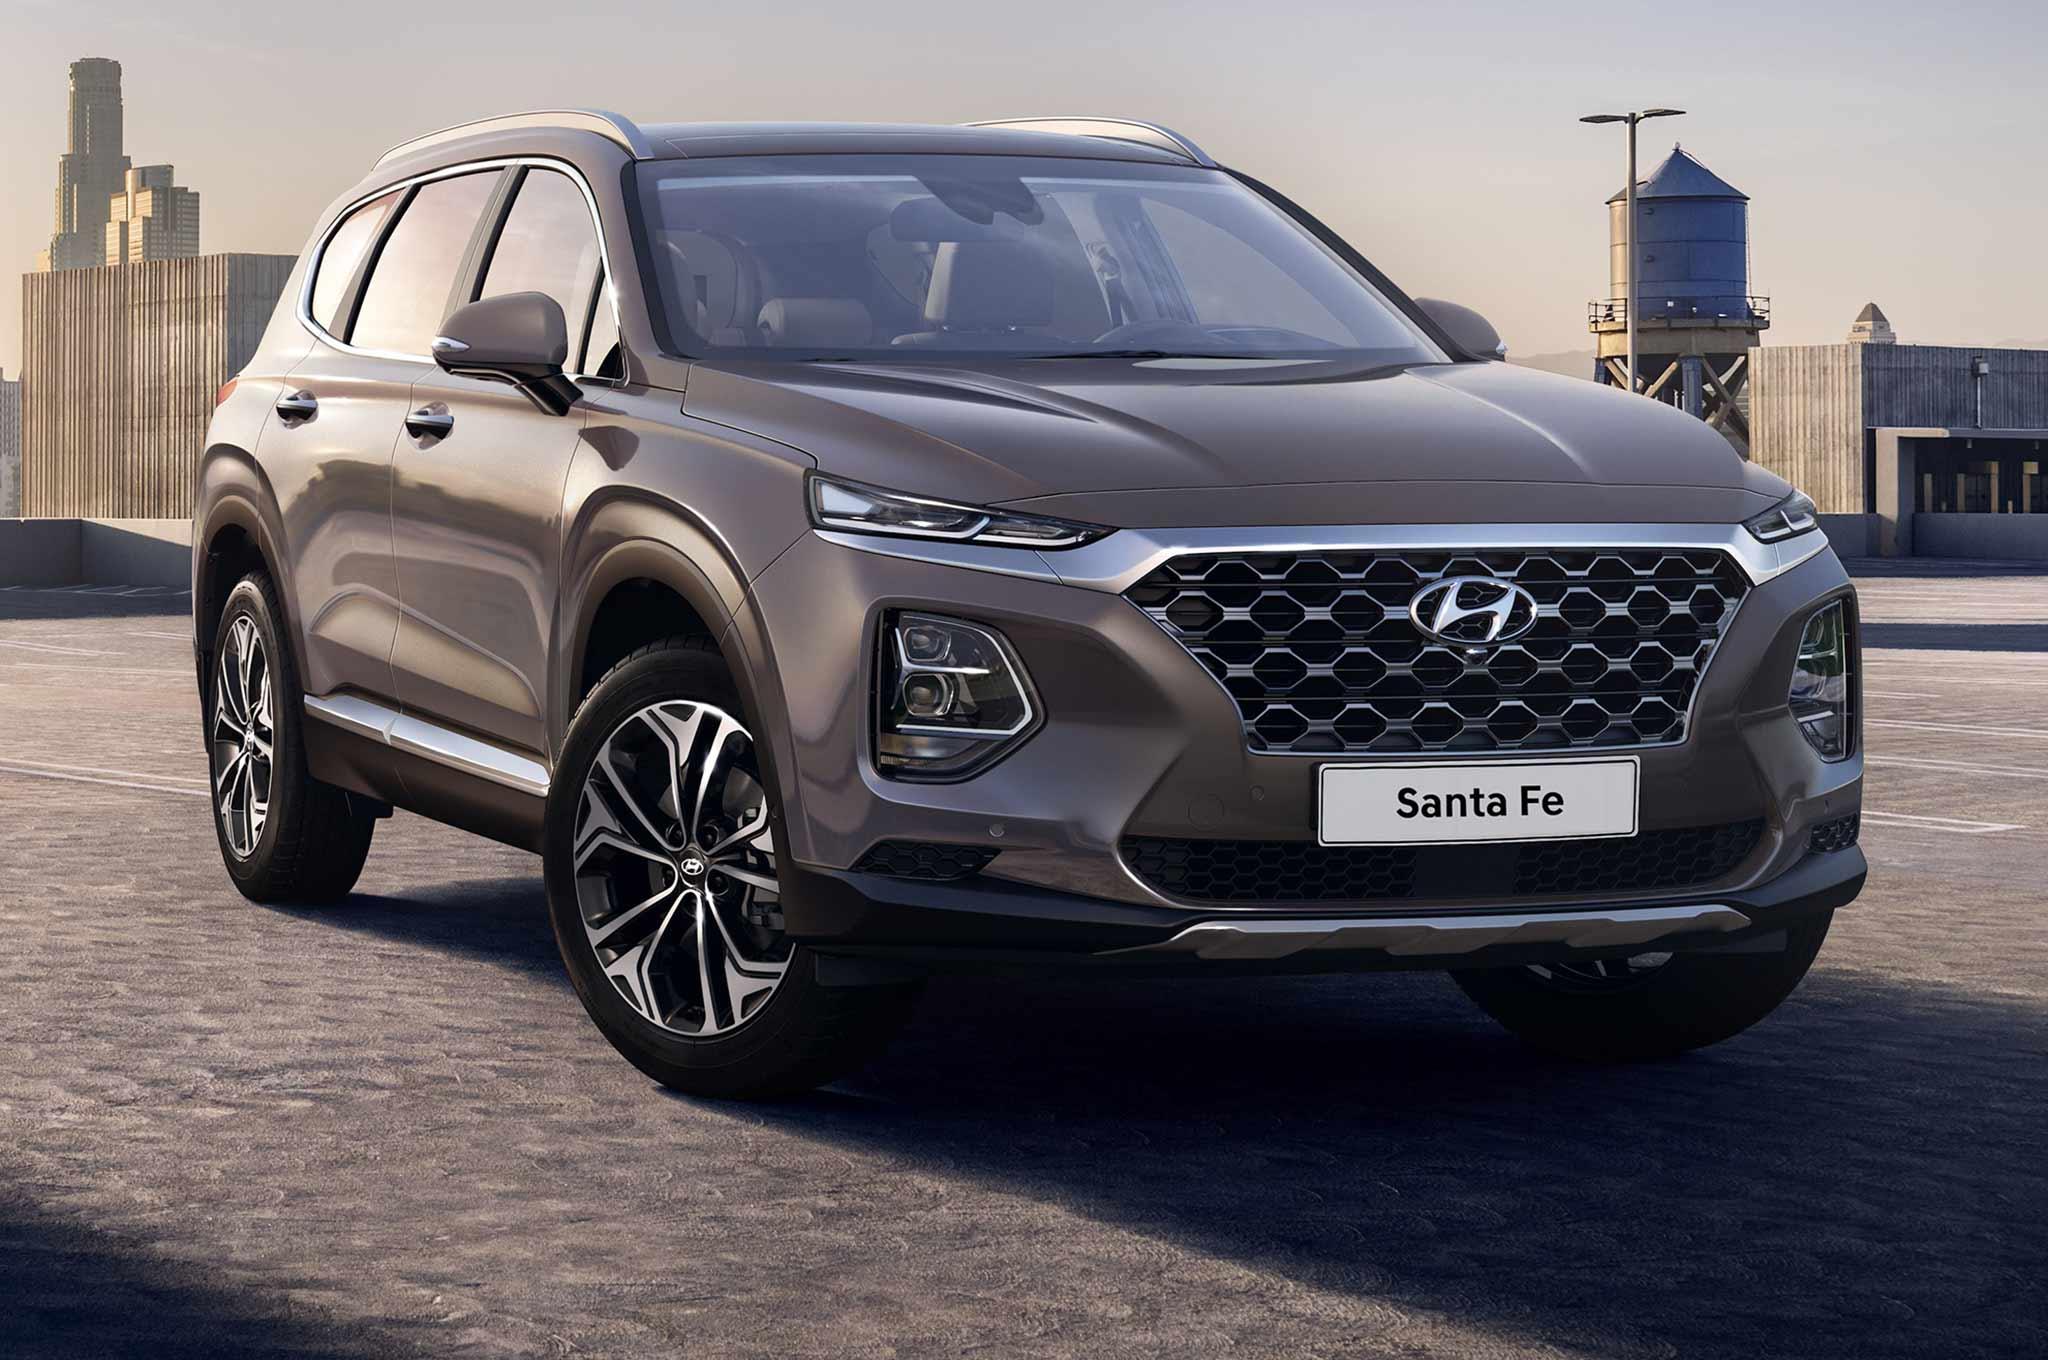 2019 Hyundai Santa Fe Korean Market Front Three Quarter